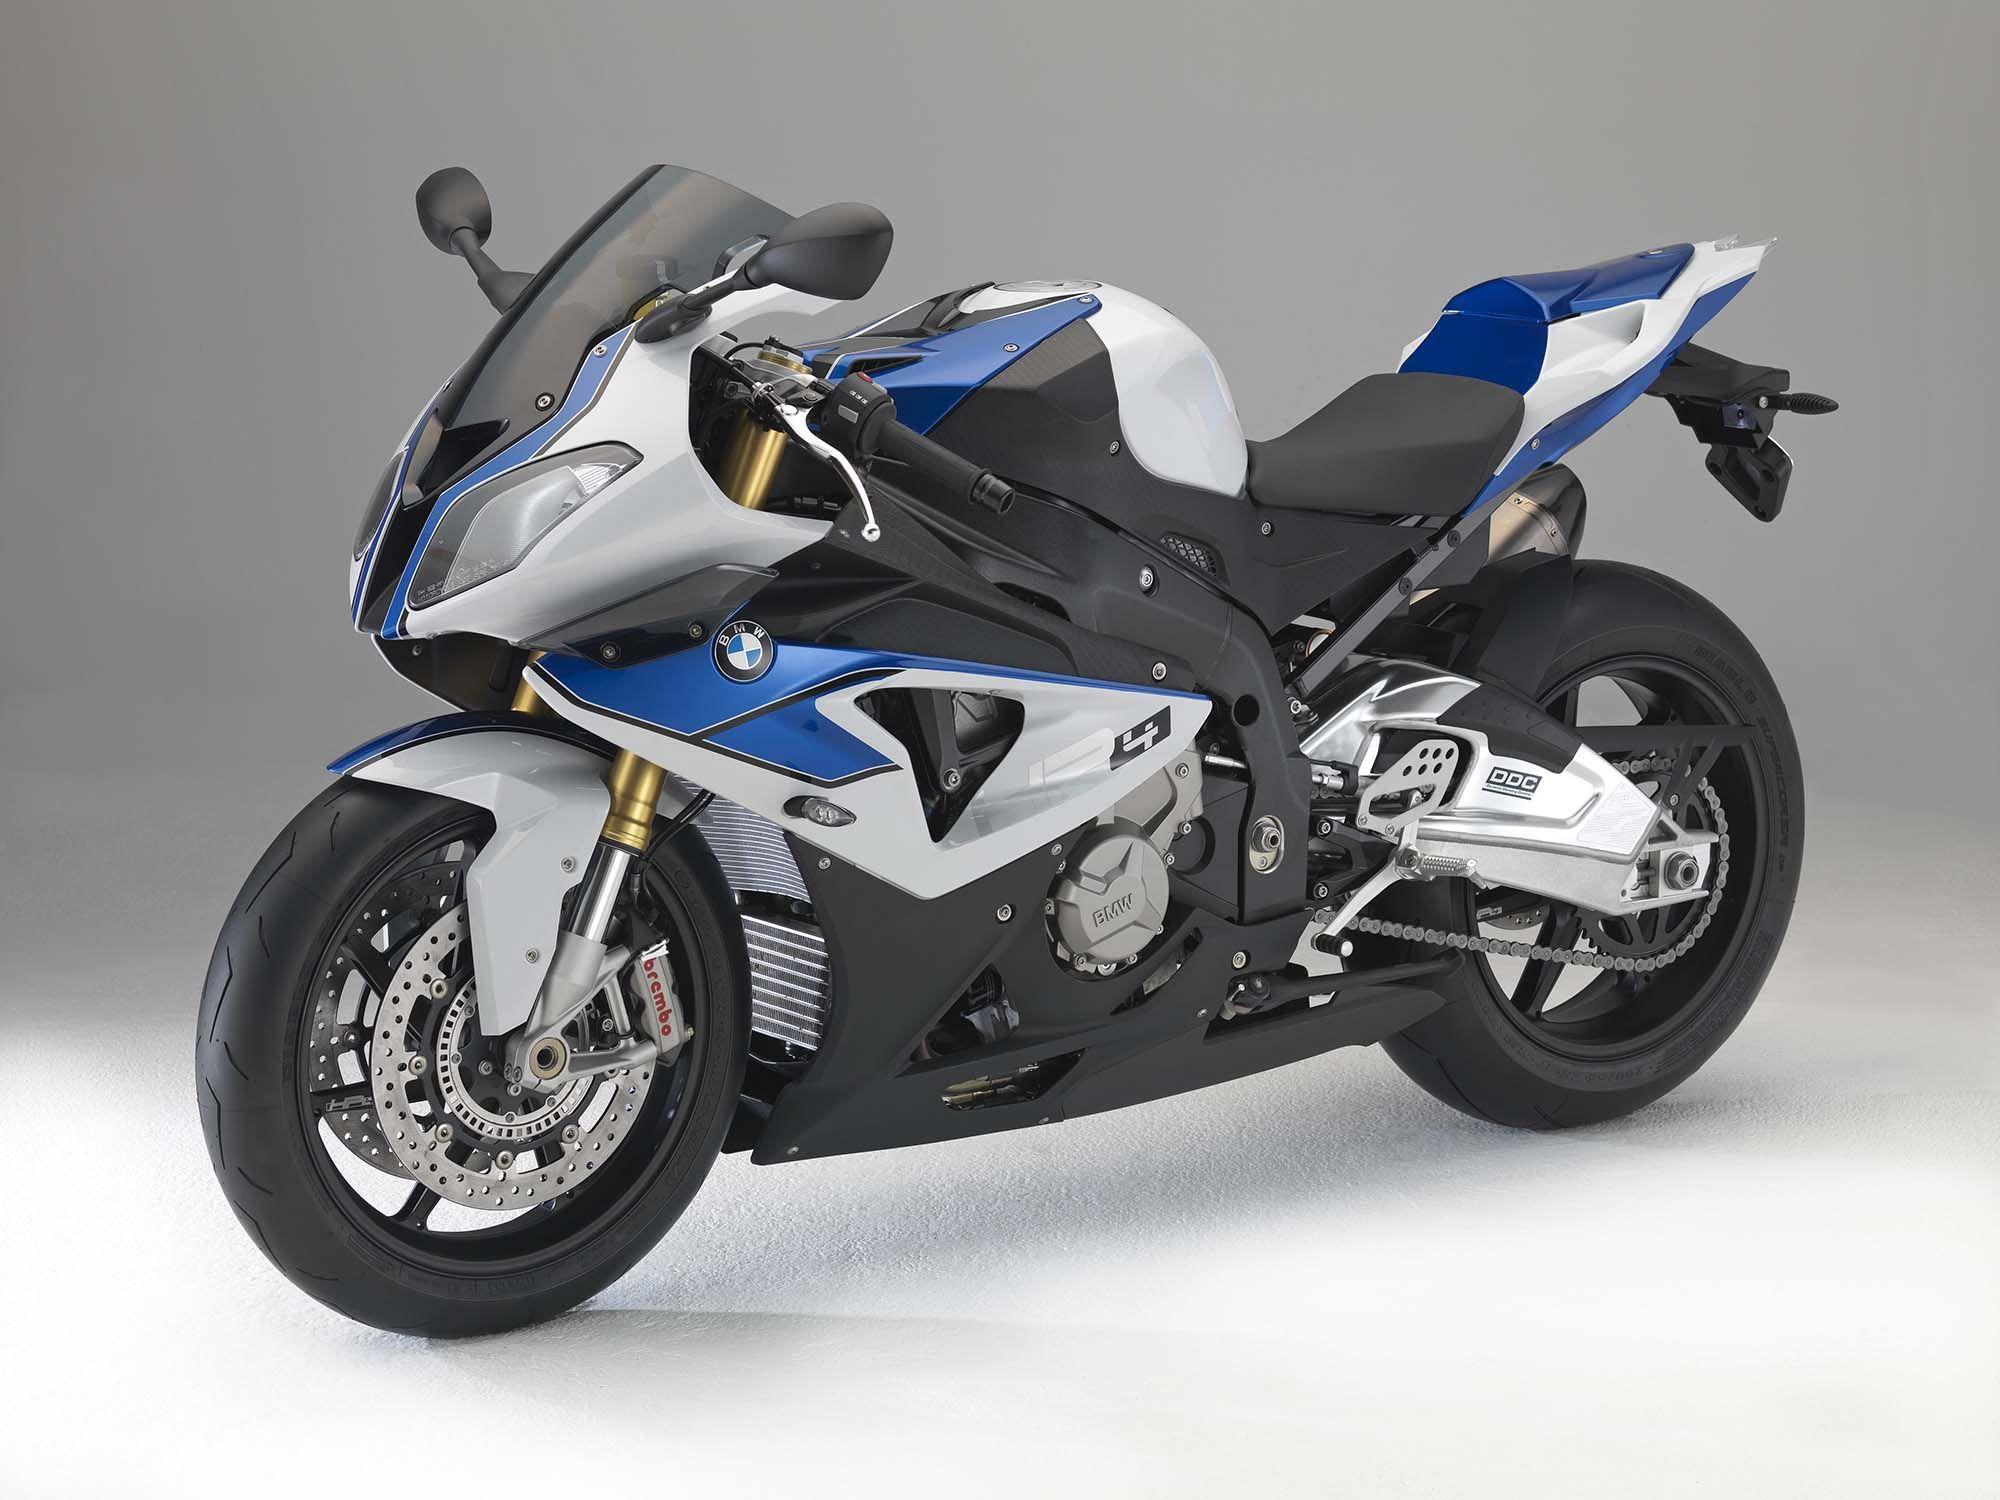 Bmw Hp4 Mega Gallery Video Bmw Motorcycle Motorcycle Bmw S1000rr